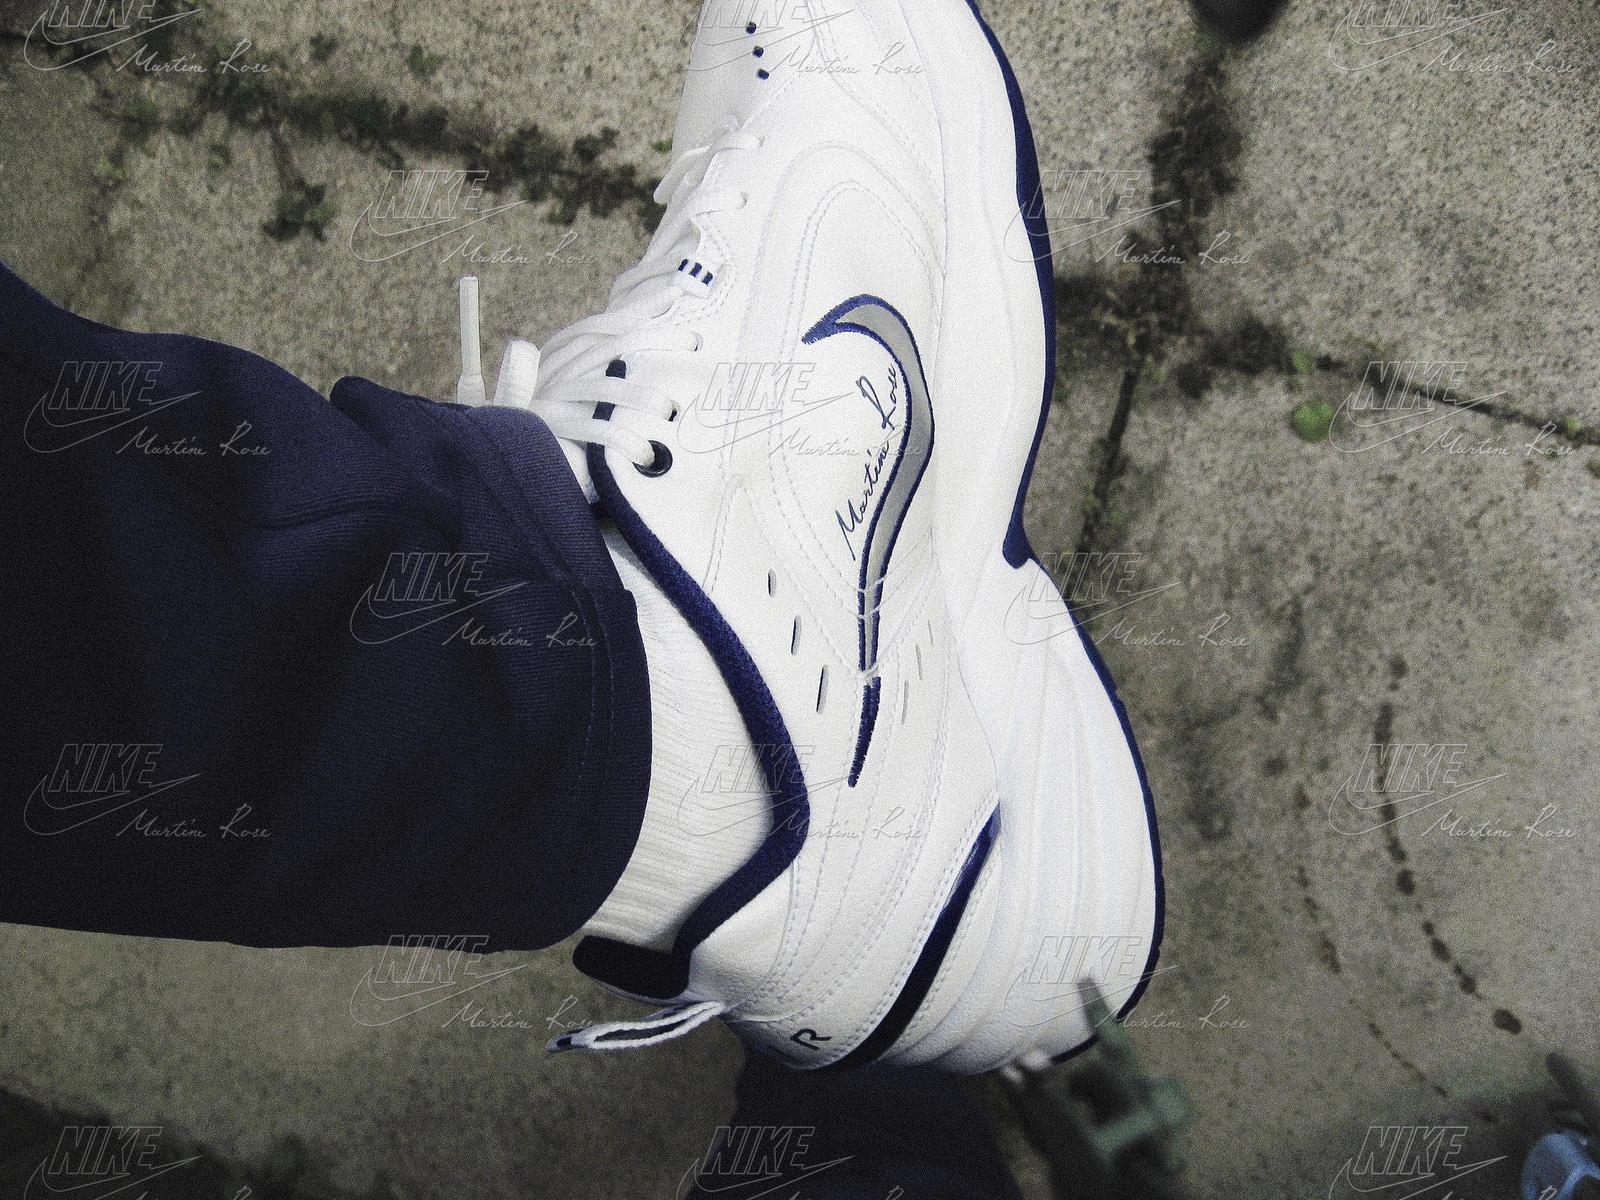 Martine Rose x Nike | Collater.al 7